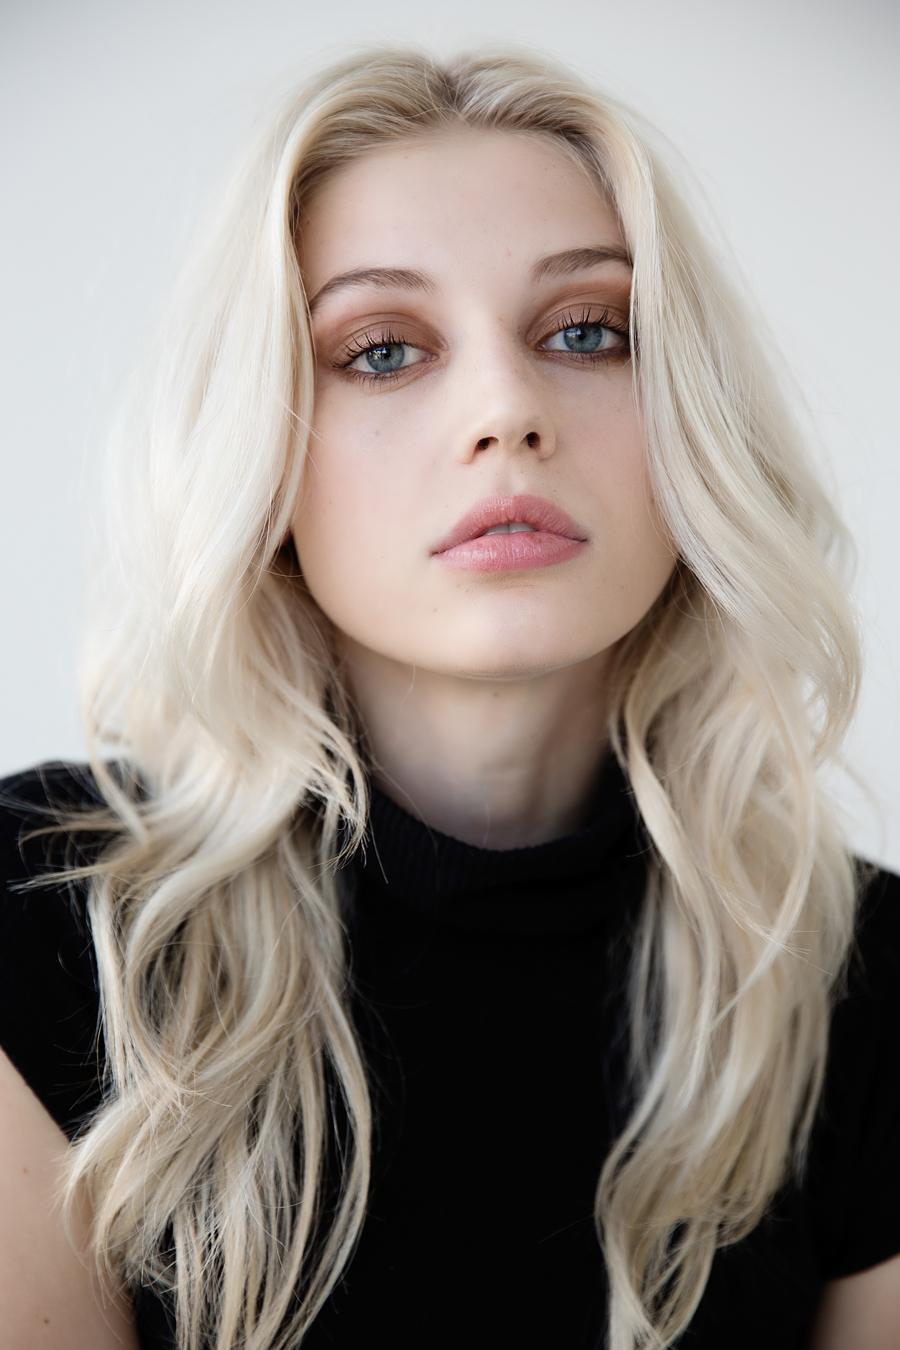 pale-blonde-girl-naked-hot-black-girl-giant-tits-gif